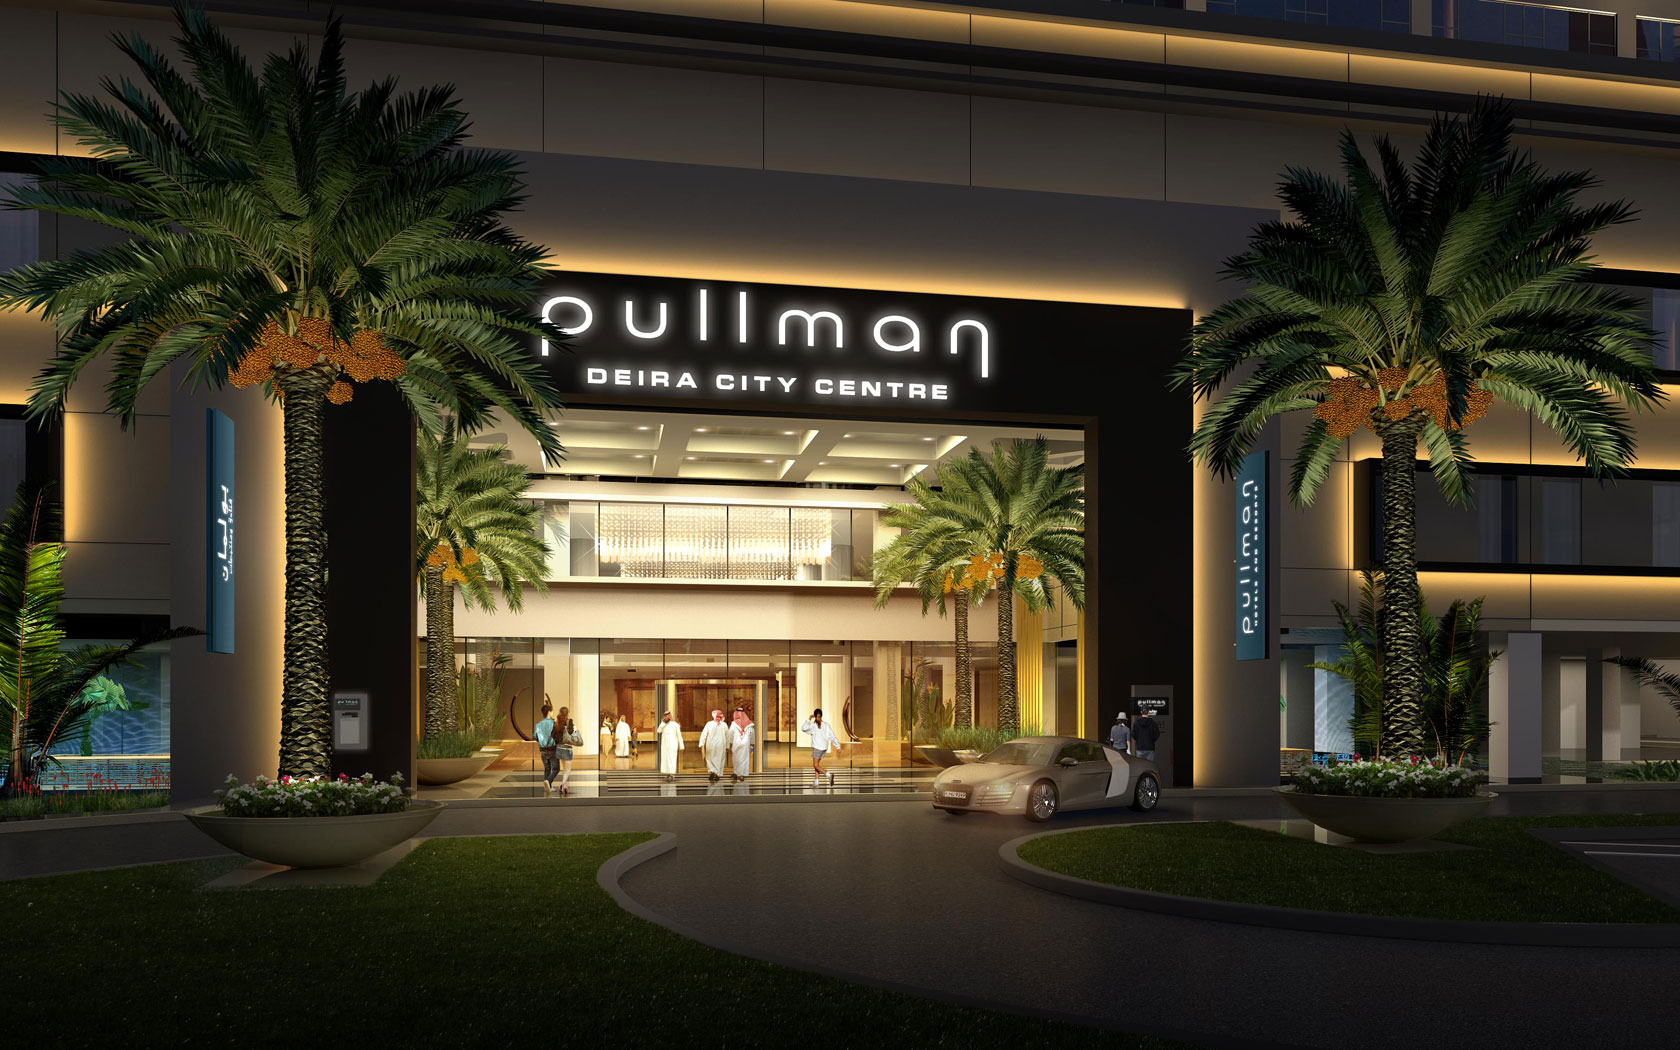 Pullman dubai deira city centre hotel officially 5 stars for Pullman hotel